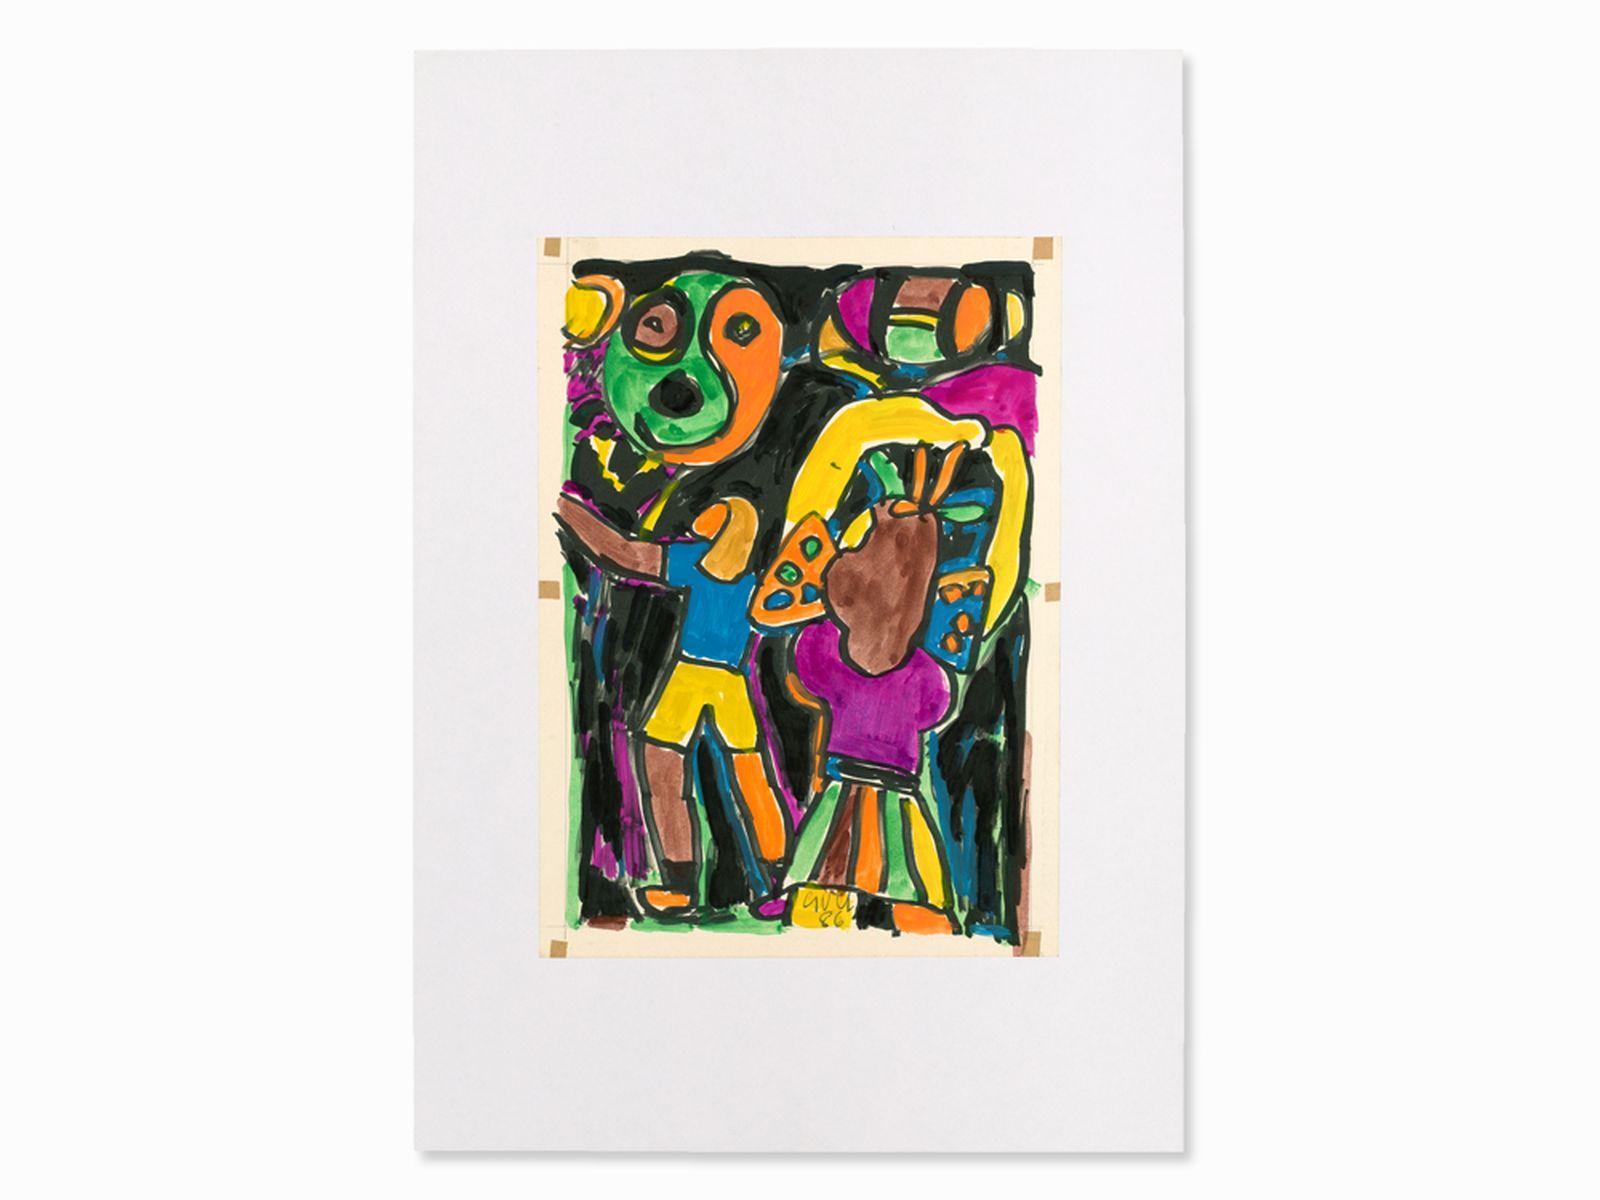 #23 Miklos Németh, Mixed Media, Colorful Composition, Hungary, ´86 | Miklos Németh, Mischtechnik, Lebhafte Komposition, Ungarn,´86 Image